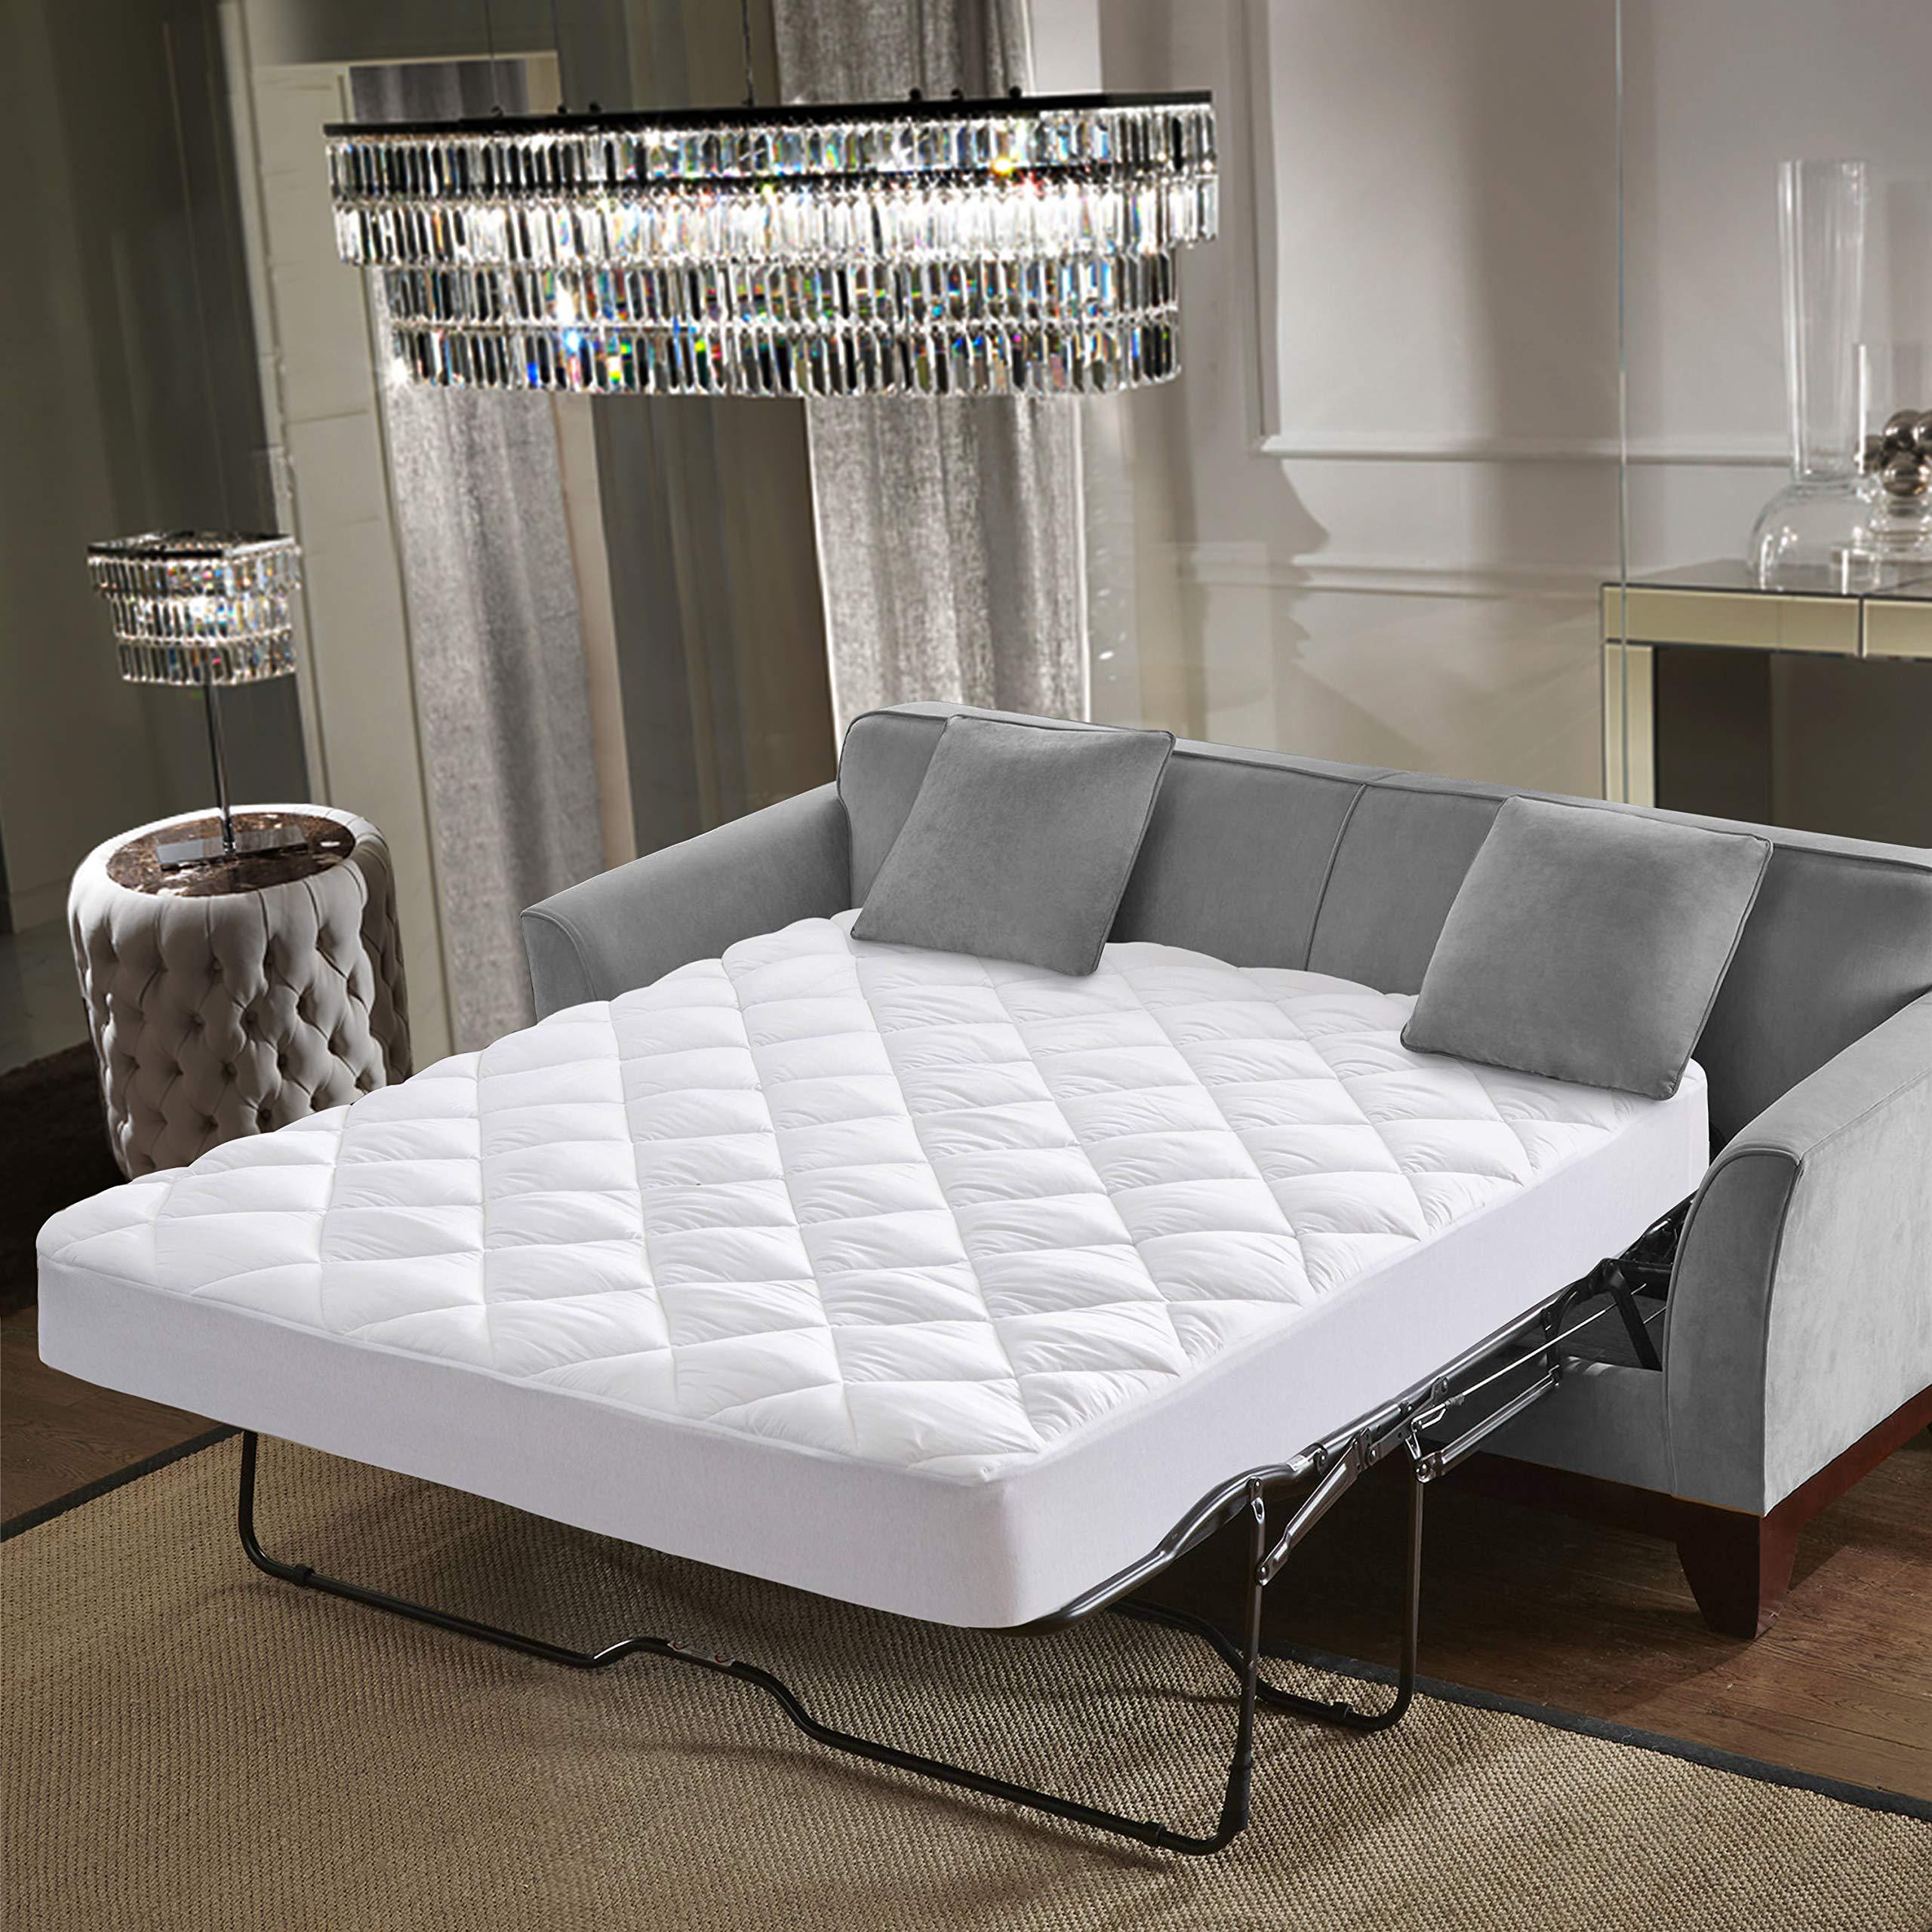 mattress topper sleeper sofa amazon com rh amazon com best mattress topper for sofa sleeper memory foam mattress topper for sofa bed